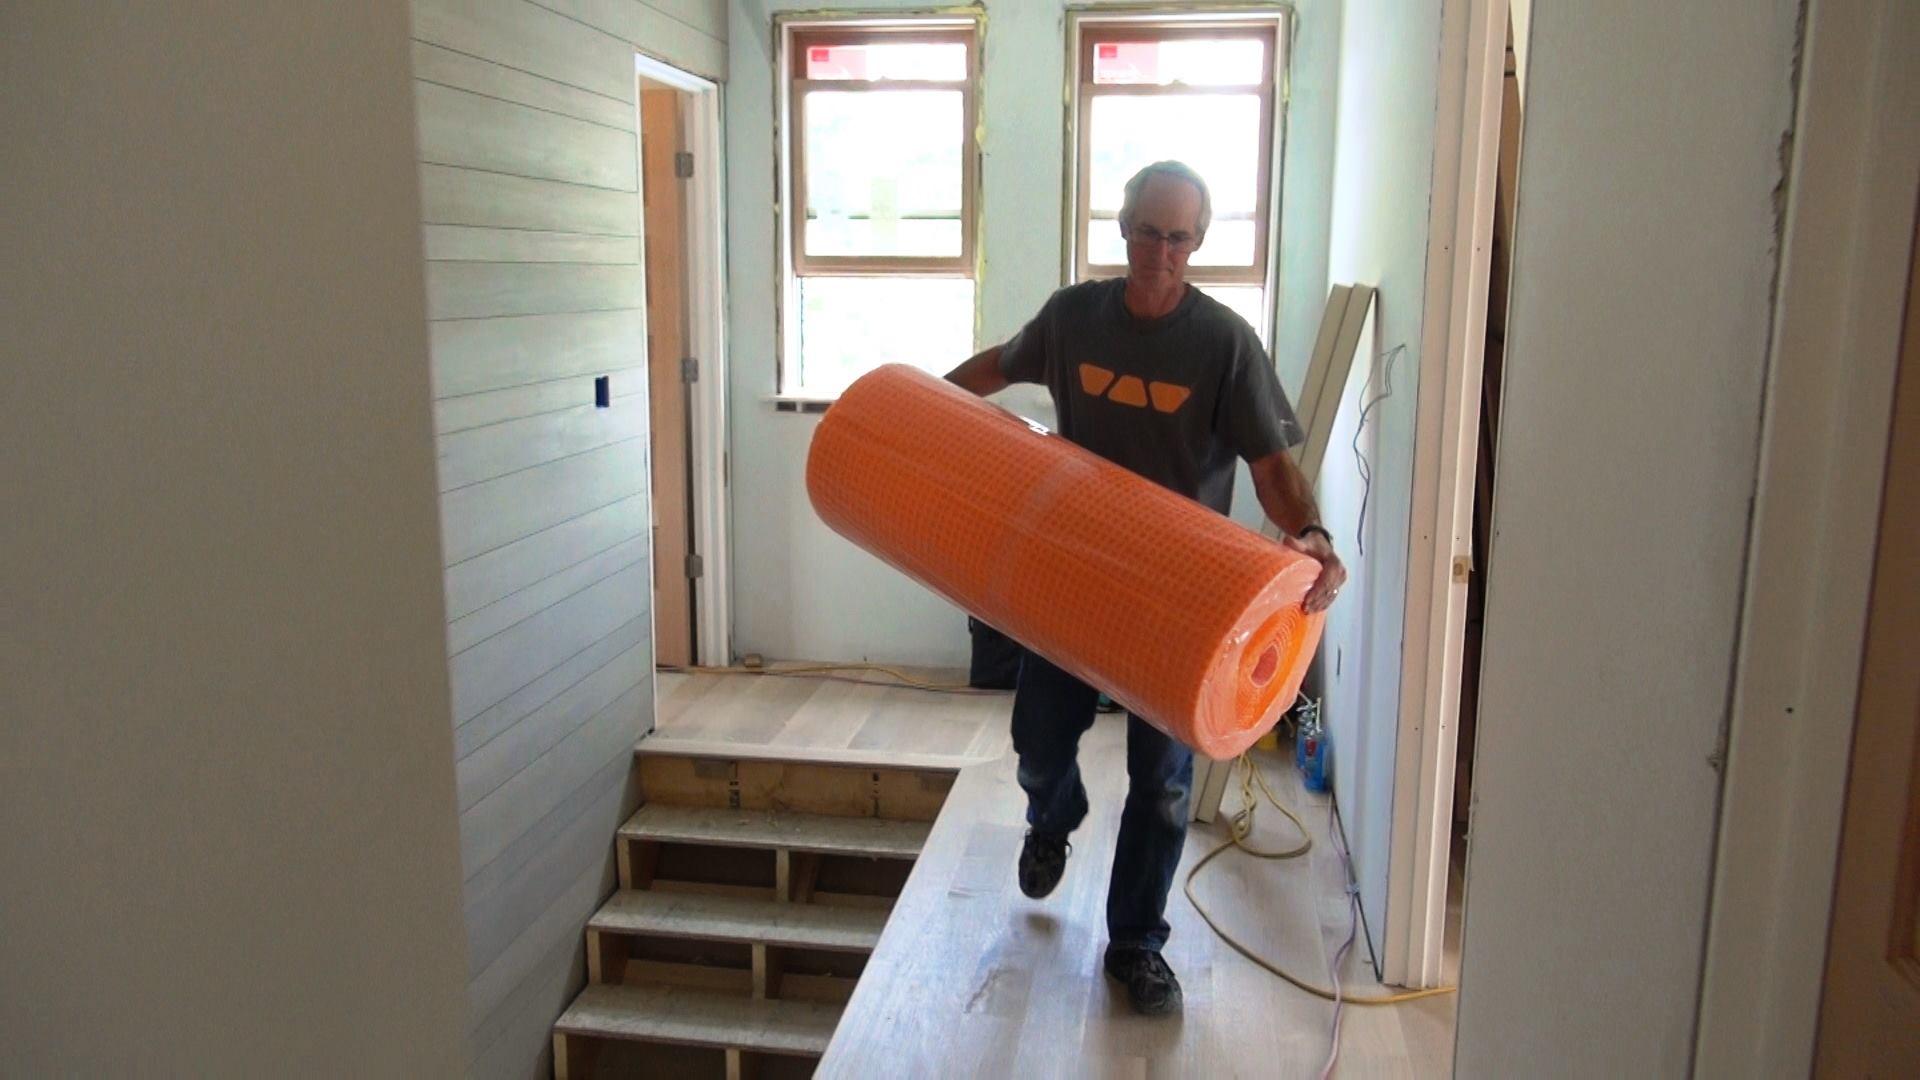 Prepping A Bathroom Floor For Tile Jlc Online